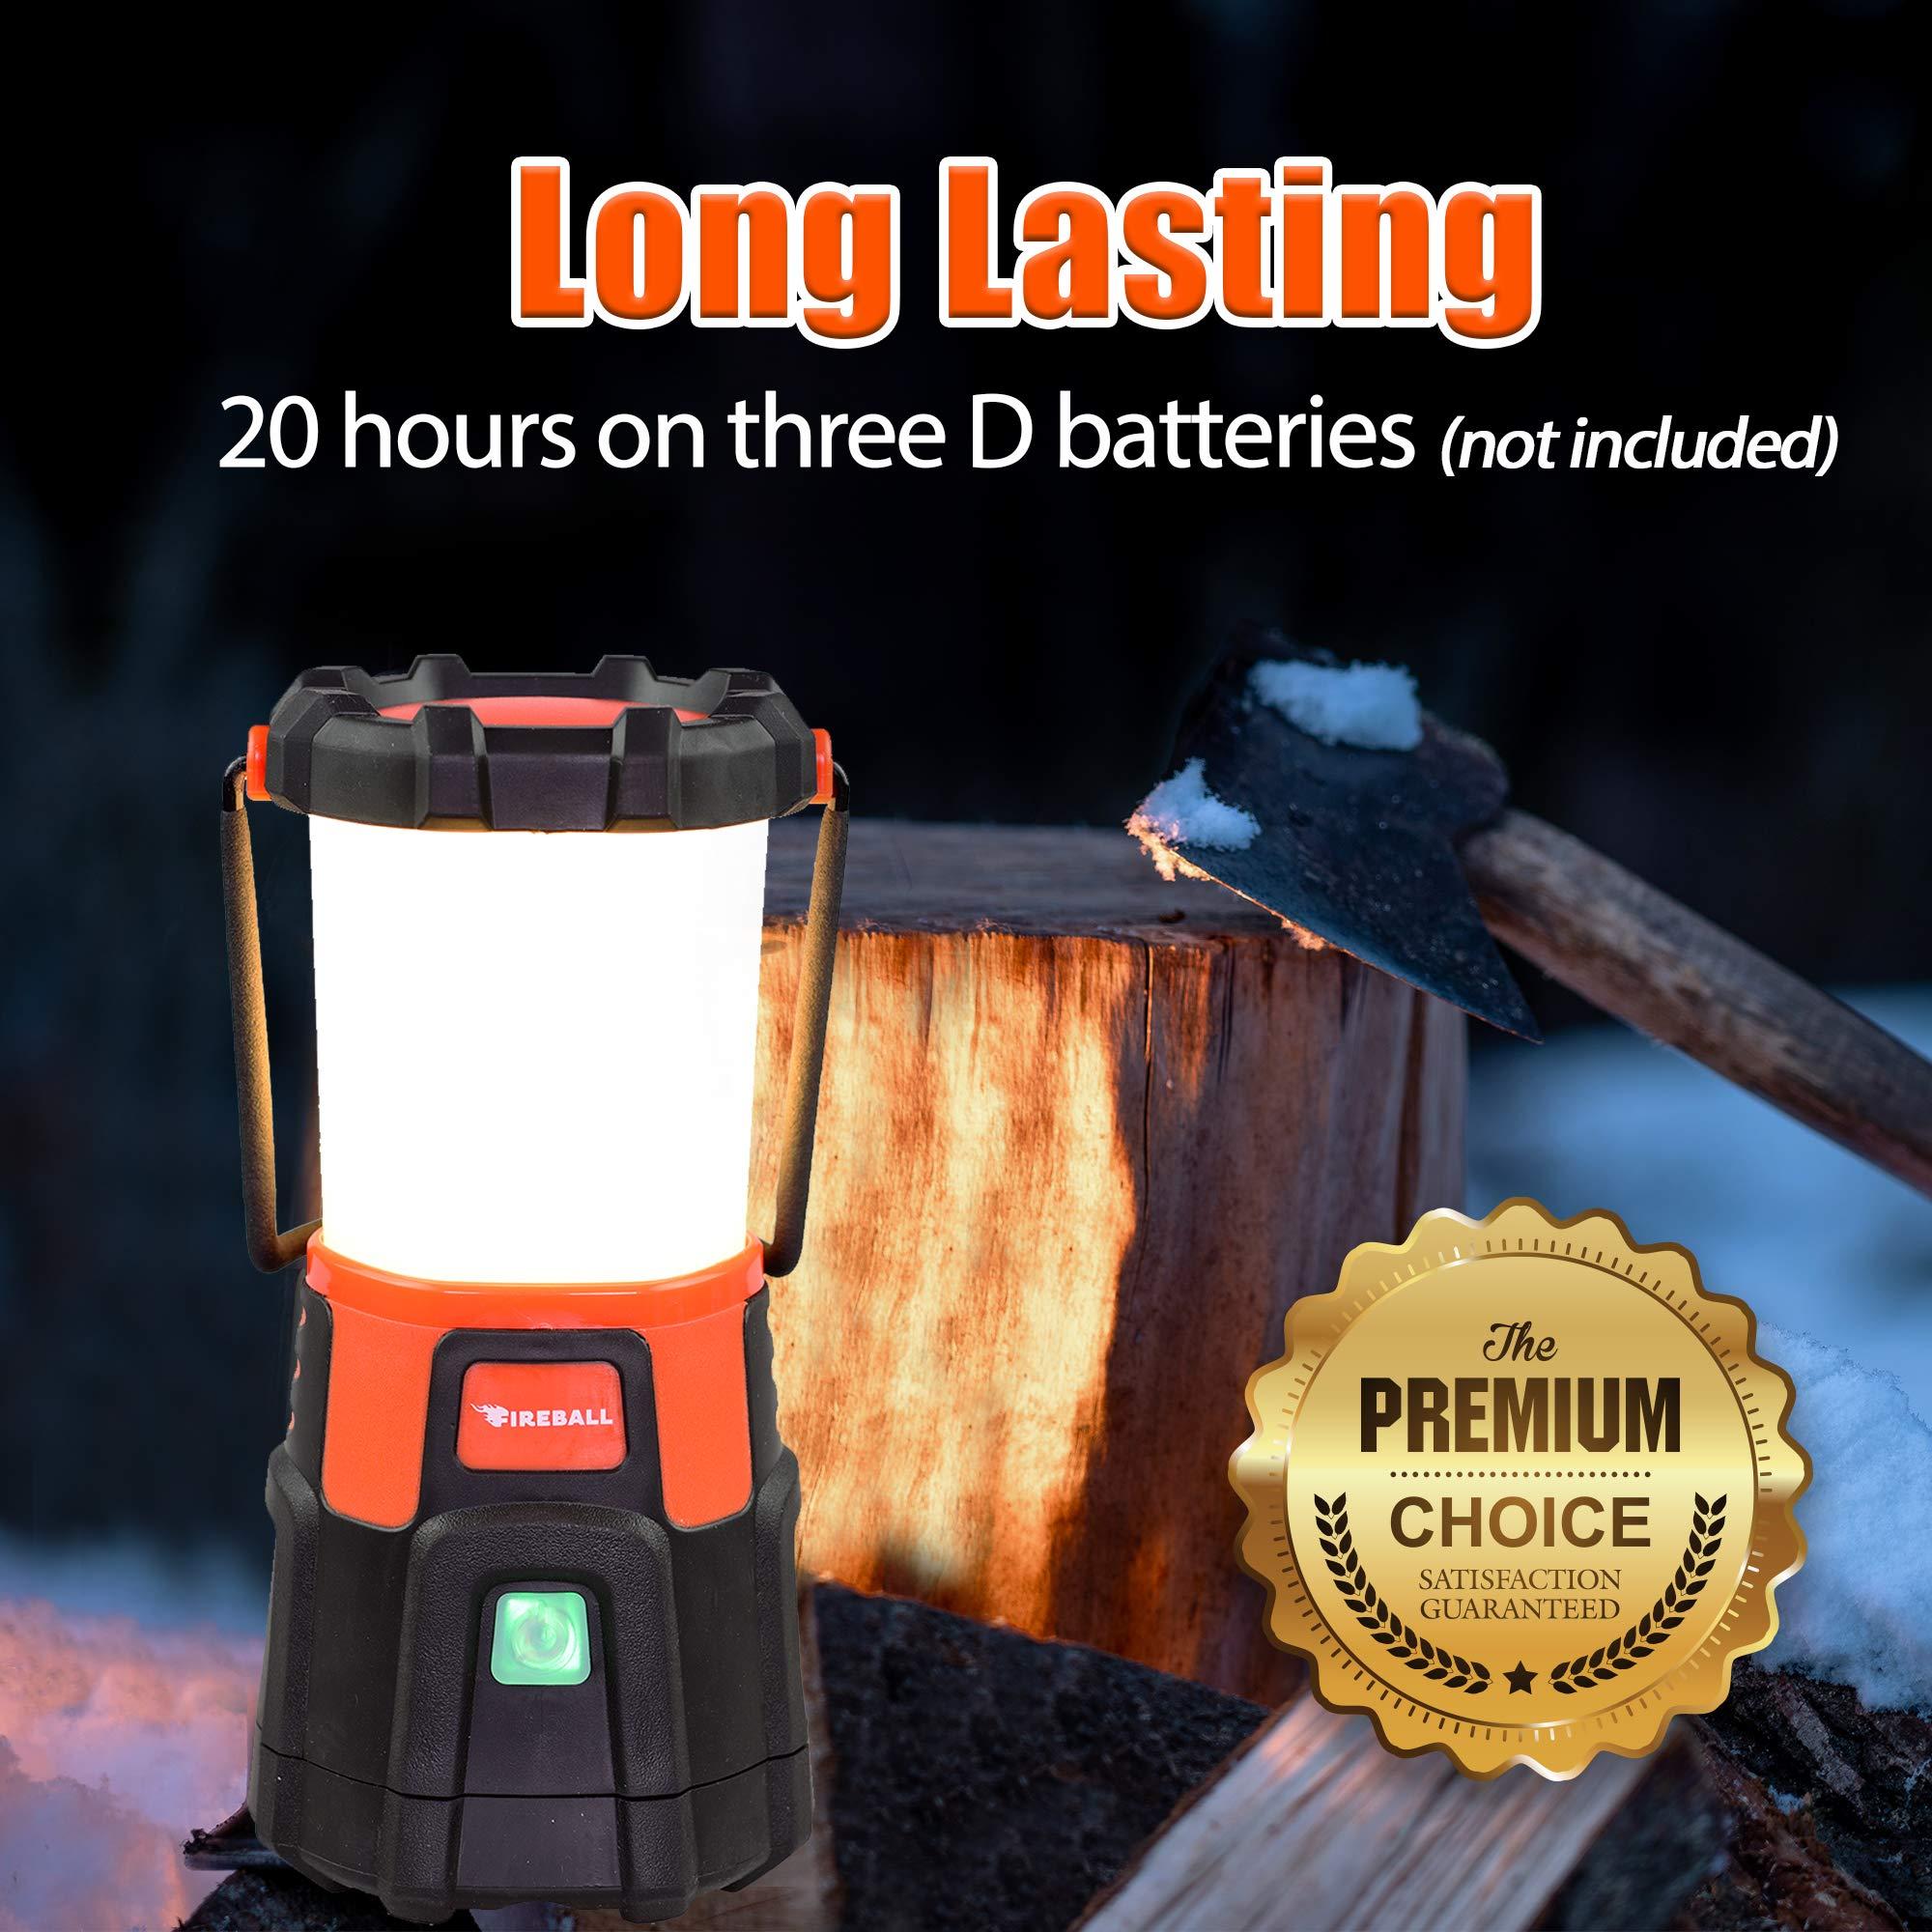 Blazin' Fireball | Brightest Lanterns Battery Powered | LED Hurricane Lantern | Emergency, Storm, Camping Torch | Battery Operated Lights | 1000 Lumen Lantern by Blazin' Bison (Image #4)